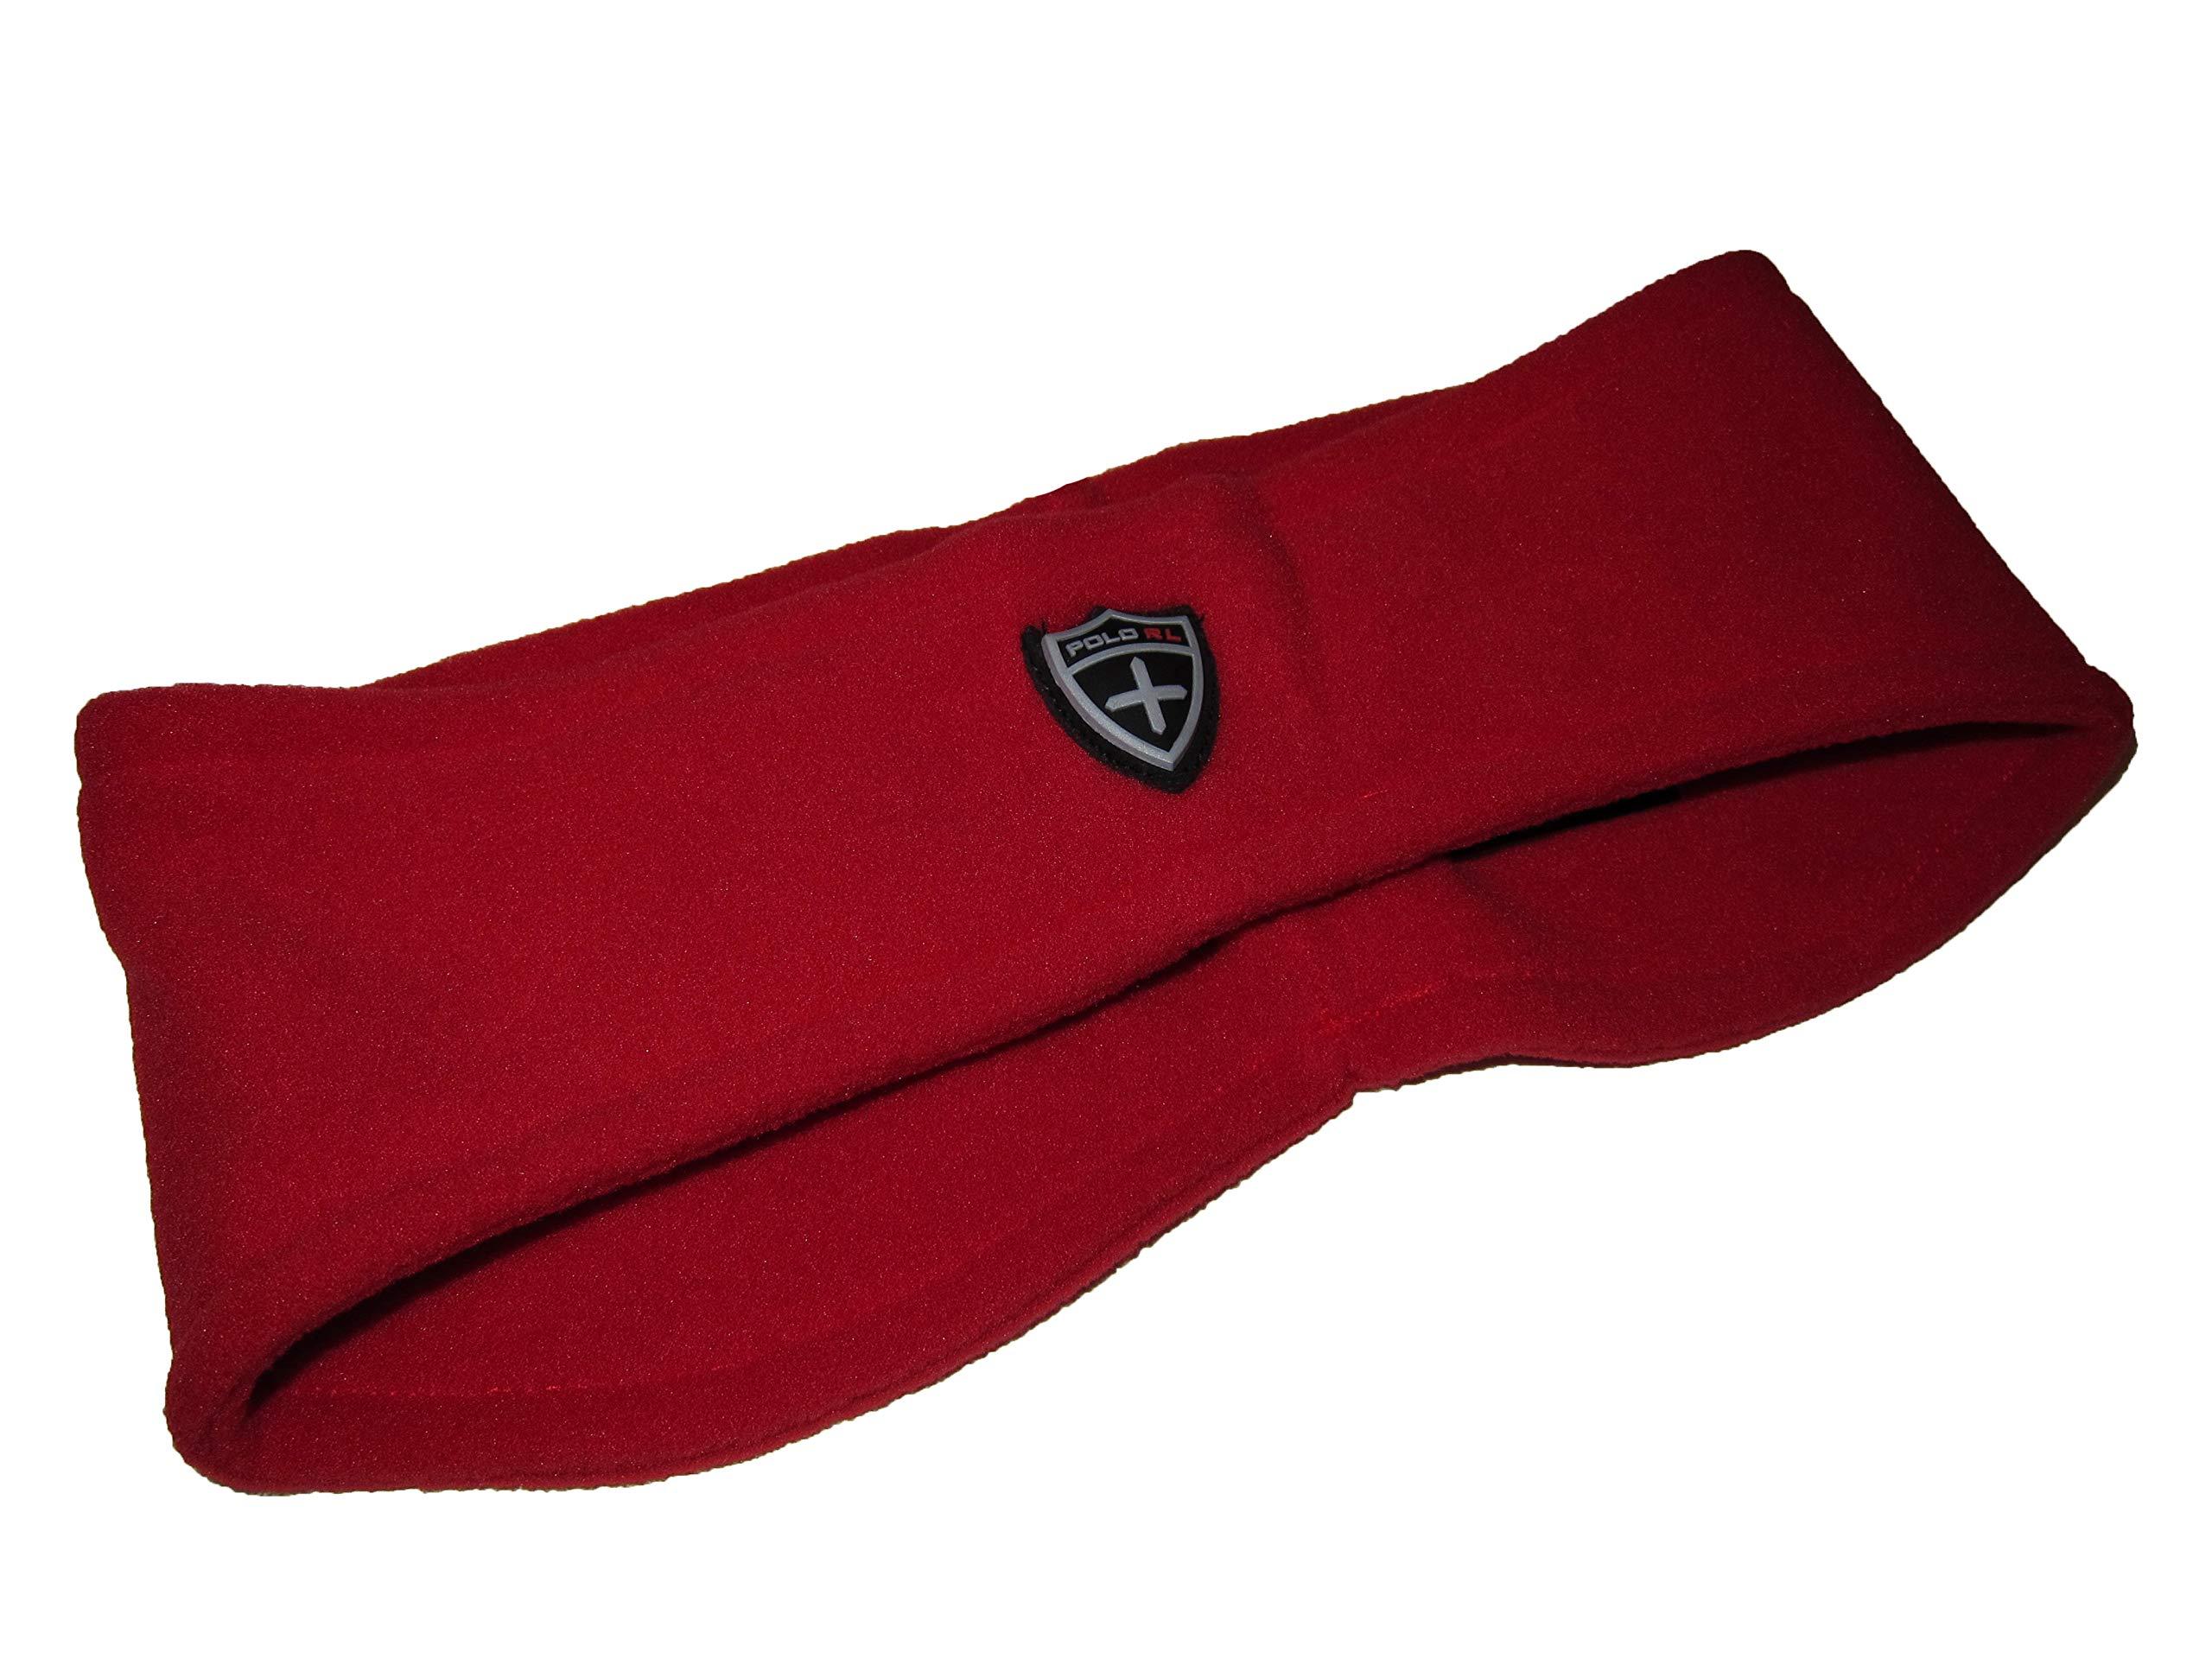 Polo Ralph Lauren Womens Polartec Fleece Cold Weather Headband (L/XL, Red) by Ralph Lauren (Image #1)